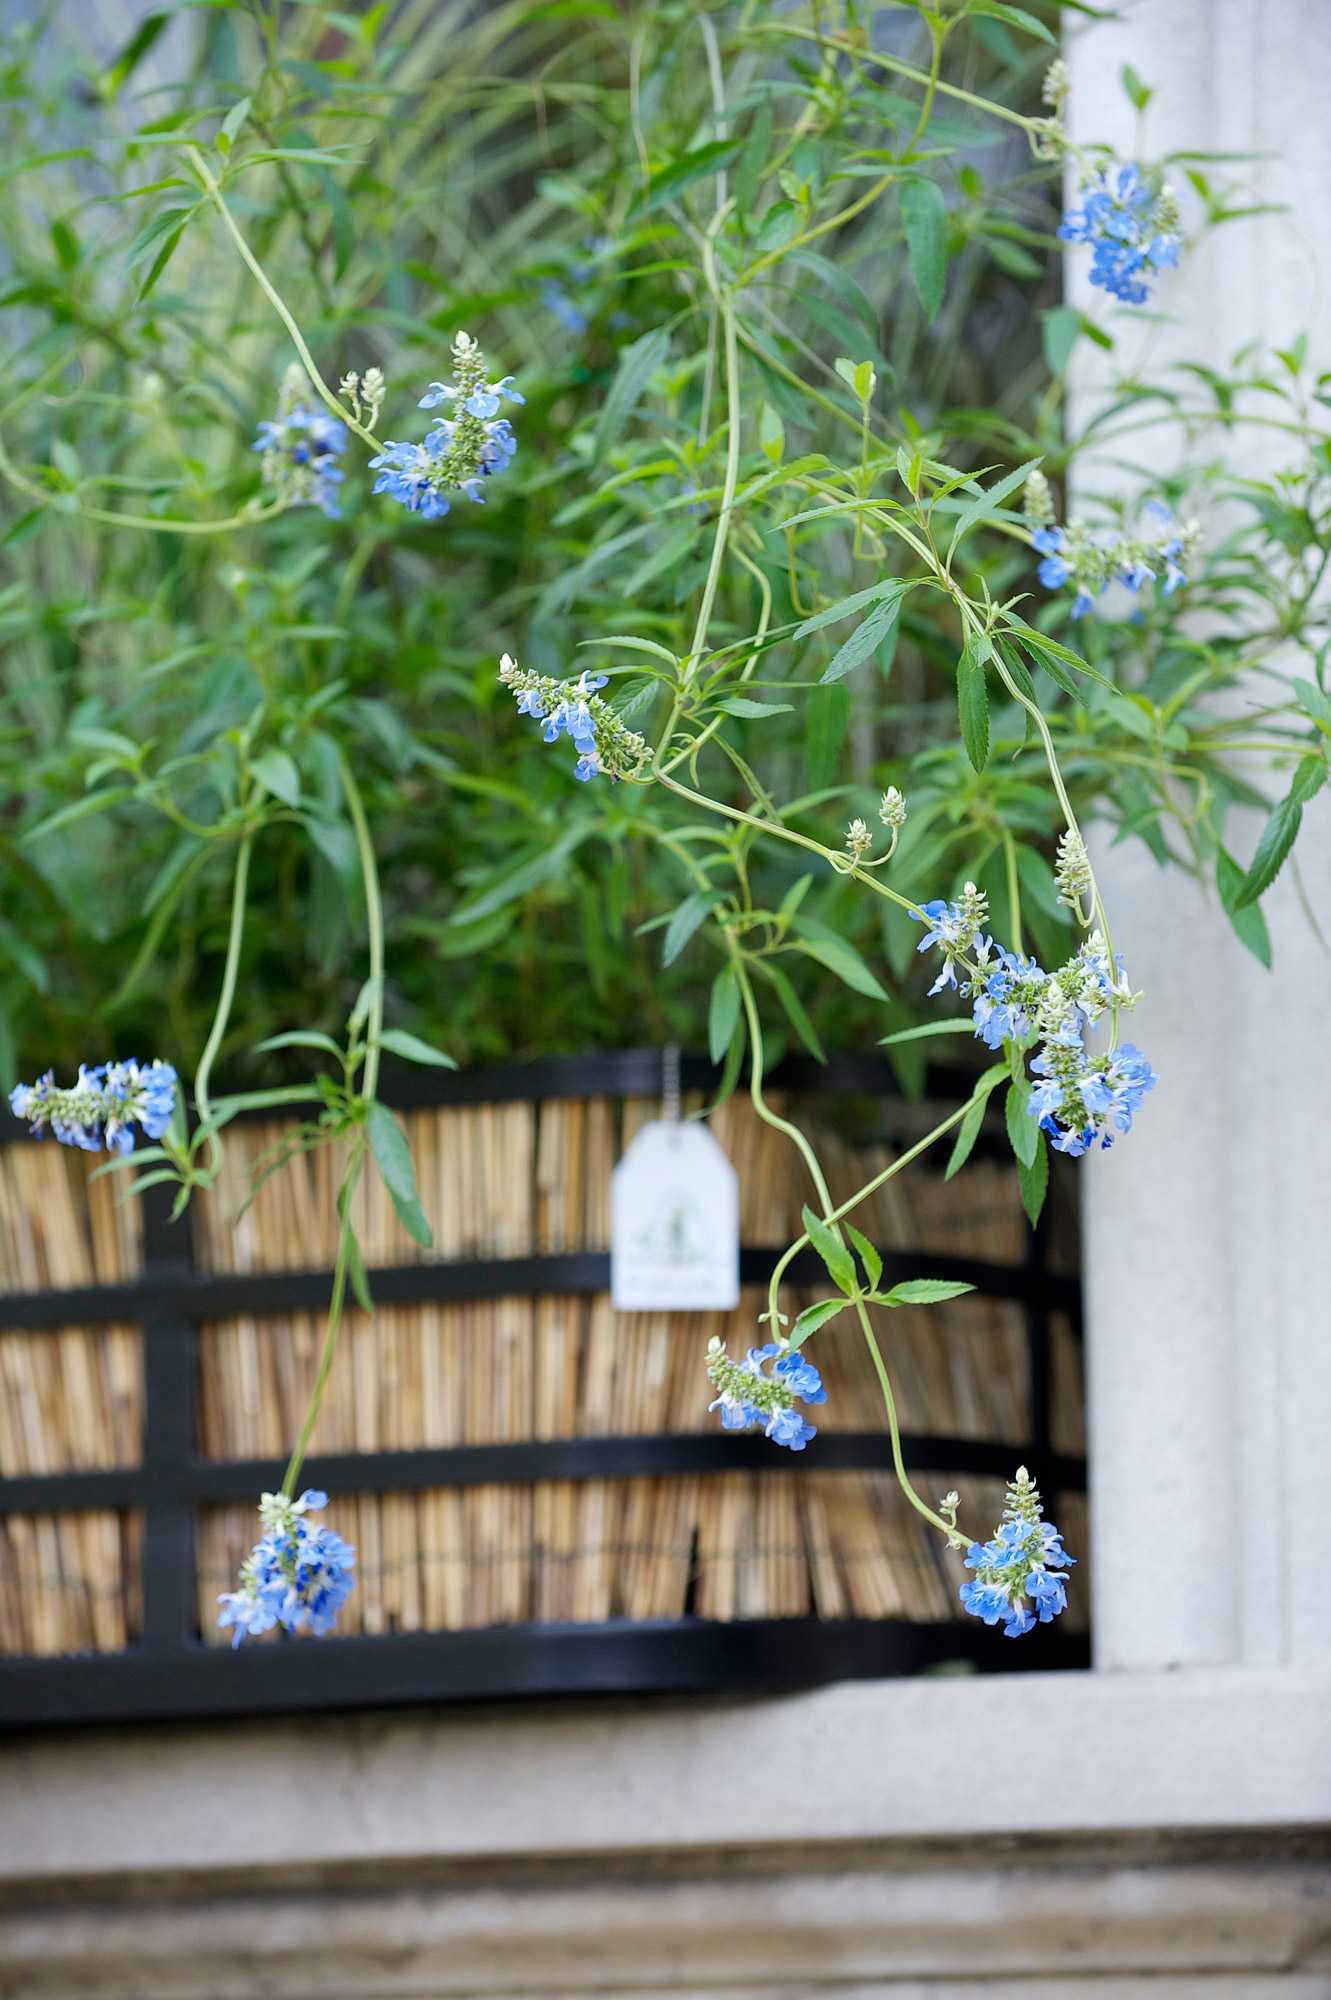 horticolario_023